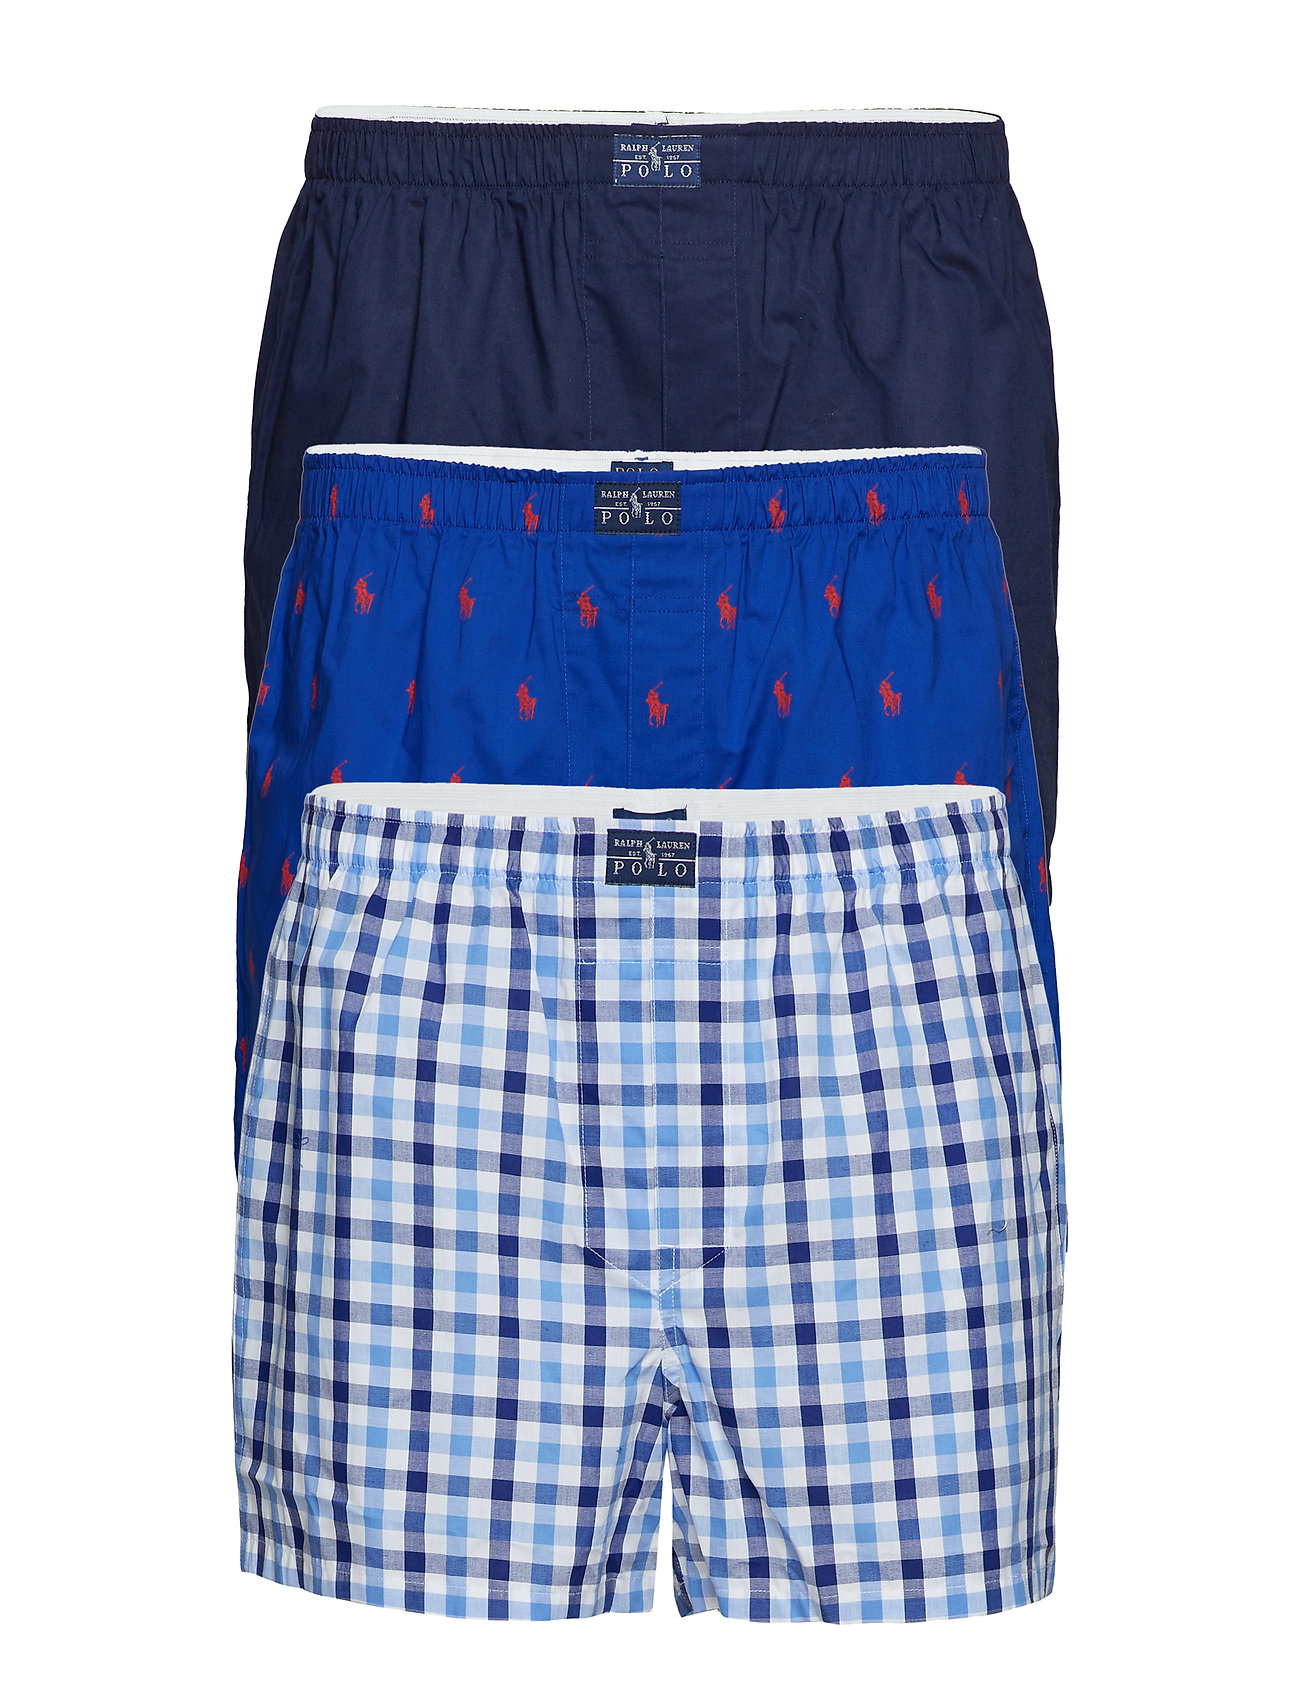 Polo Ralph Lauren Underwear Woven Cotton Boxer 3-Pack